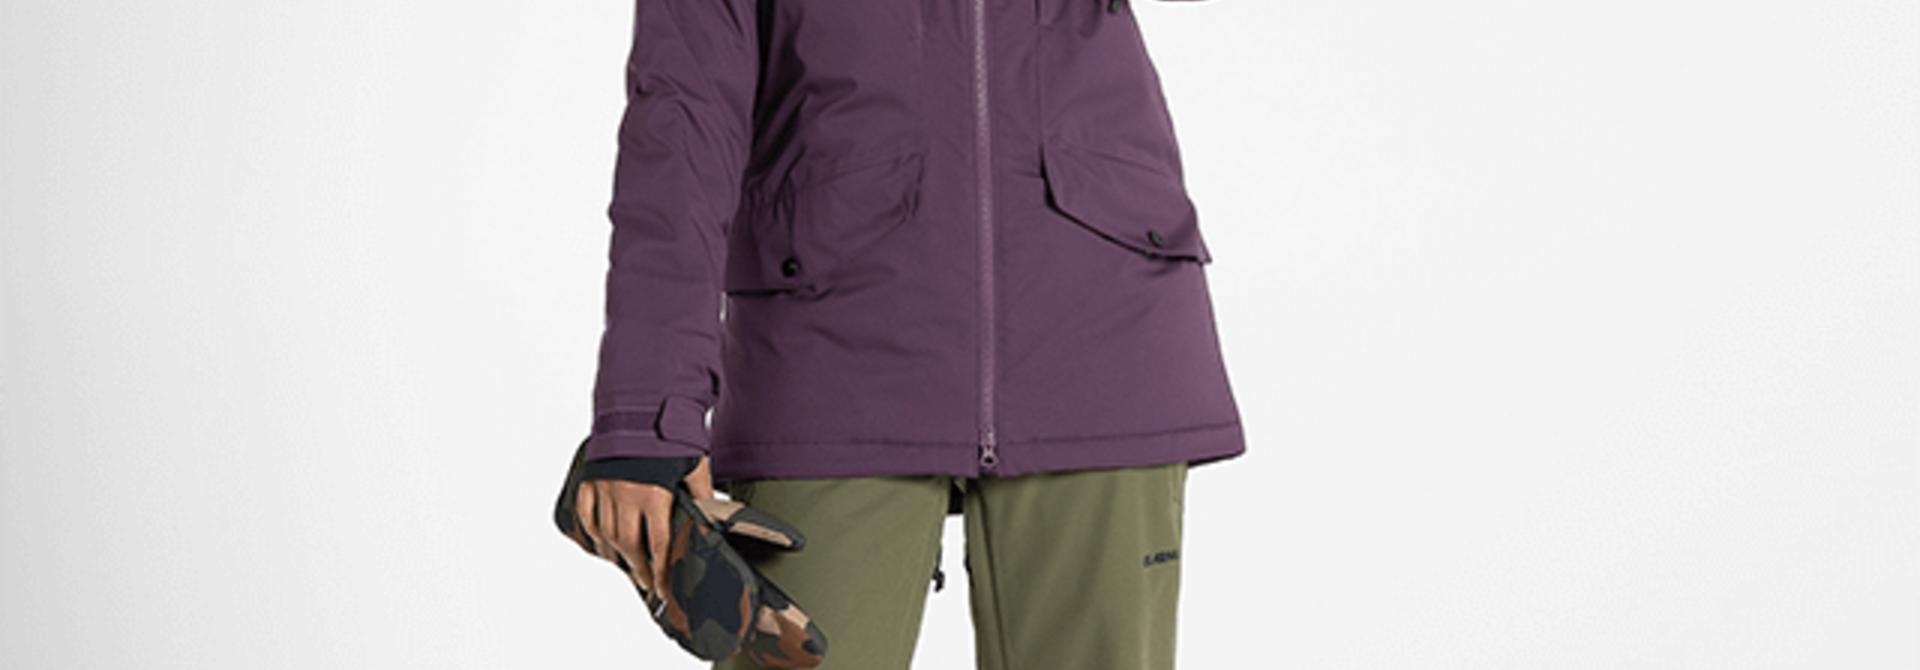 Barrena Insulated Jacket